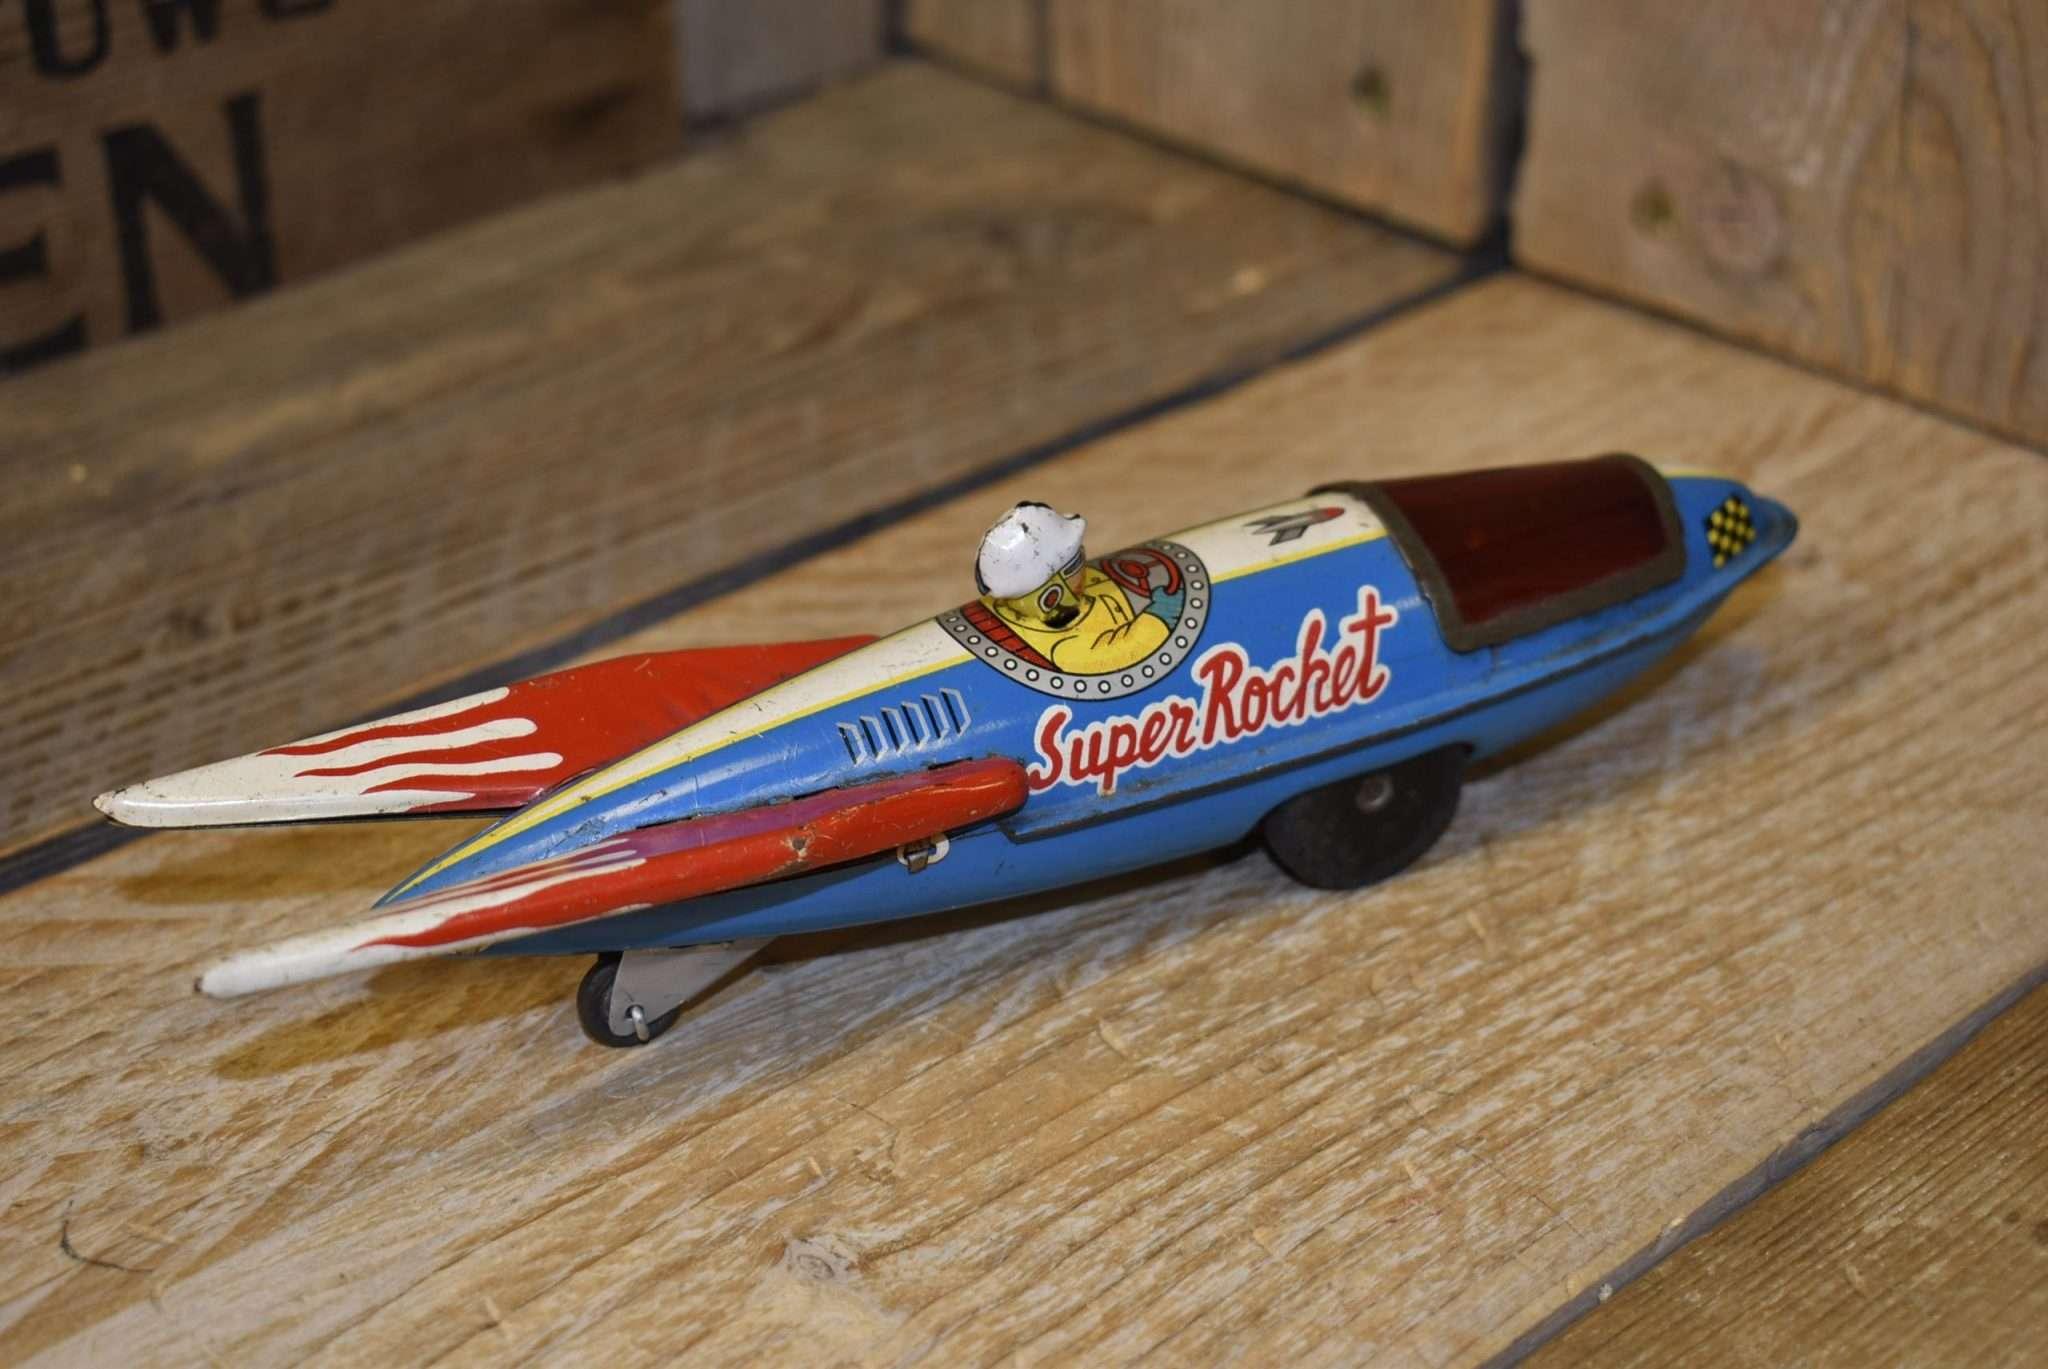 Daiya - Super Rocket